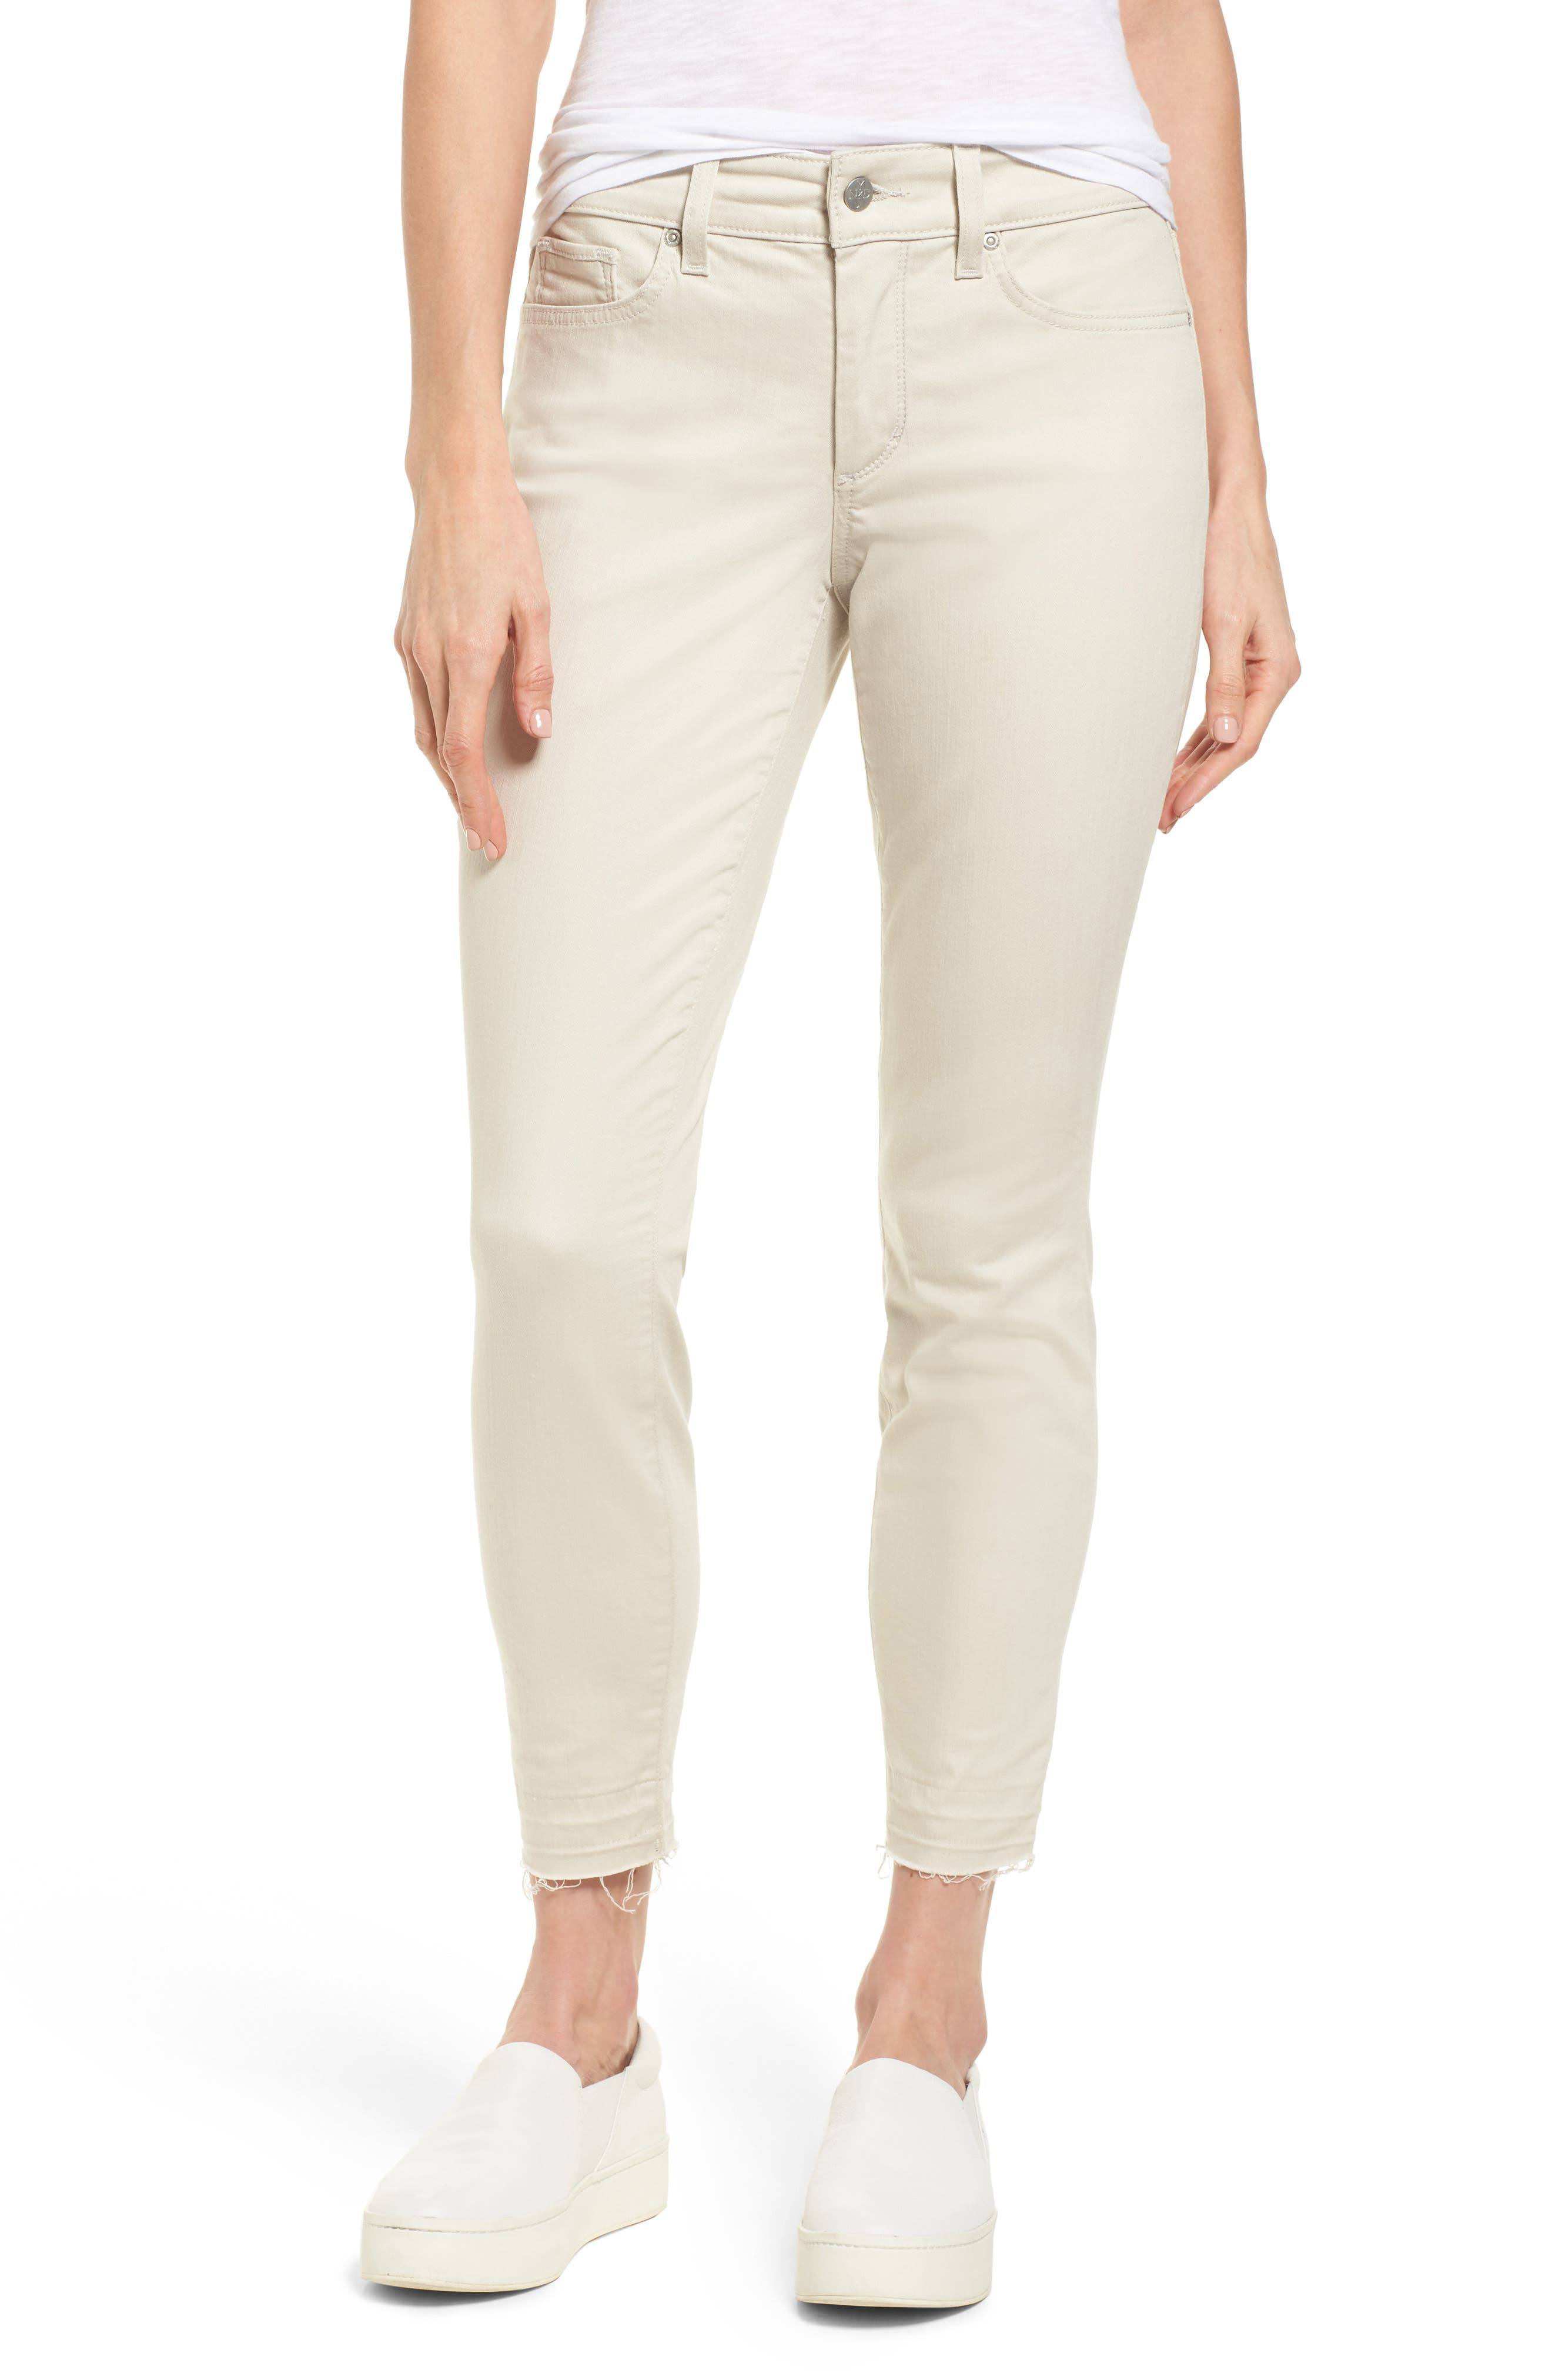 NYDJ Ami Release Hem Jeans